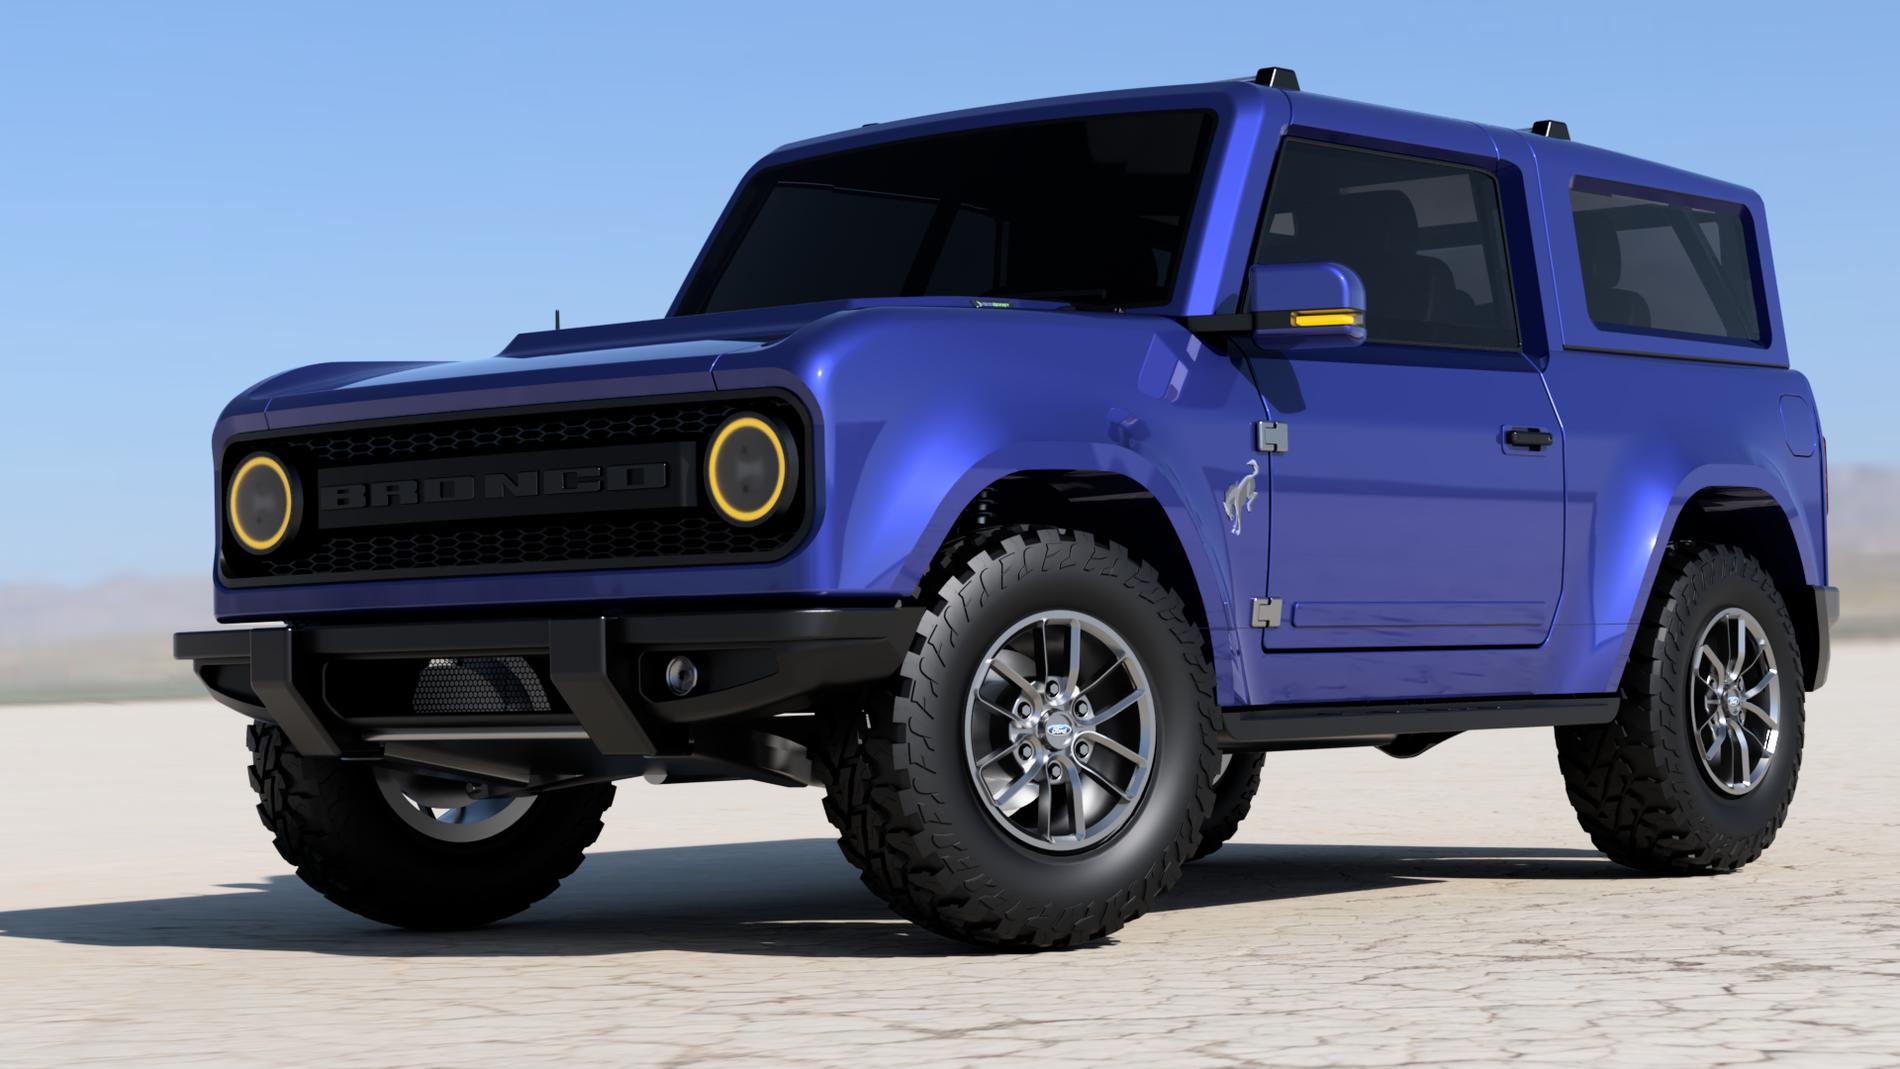 3D Model Imagines Production-Spec 2021 Ford Bronco